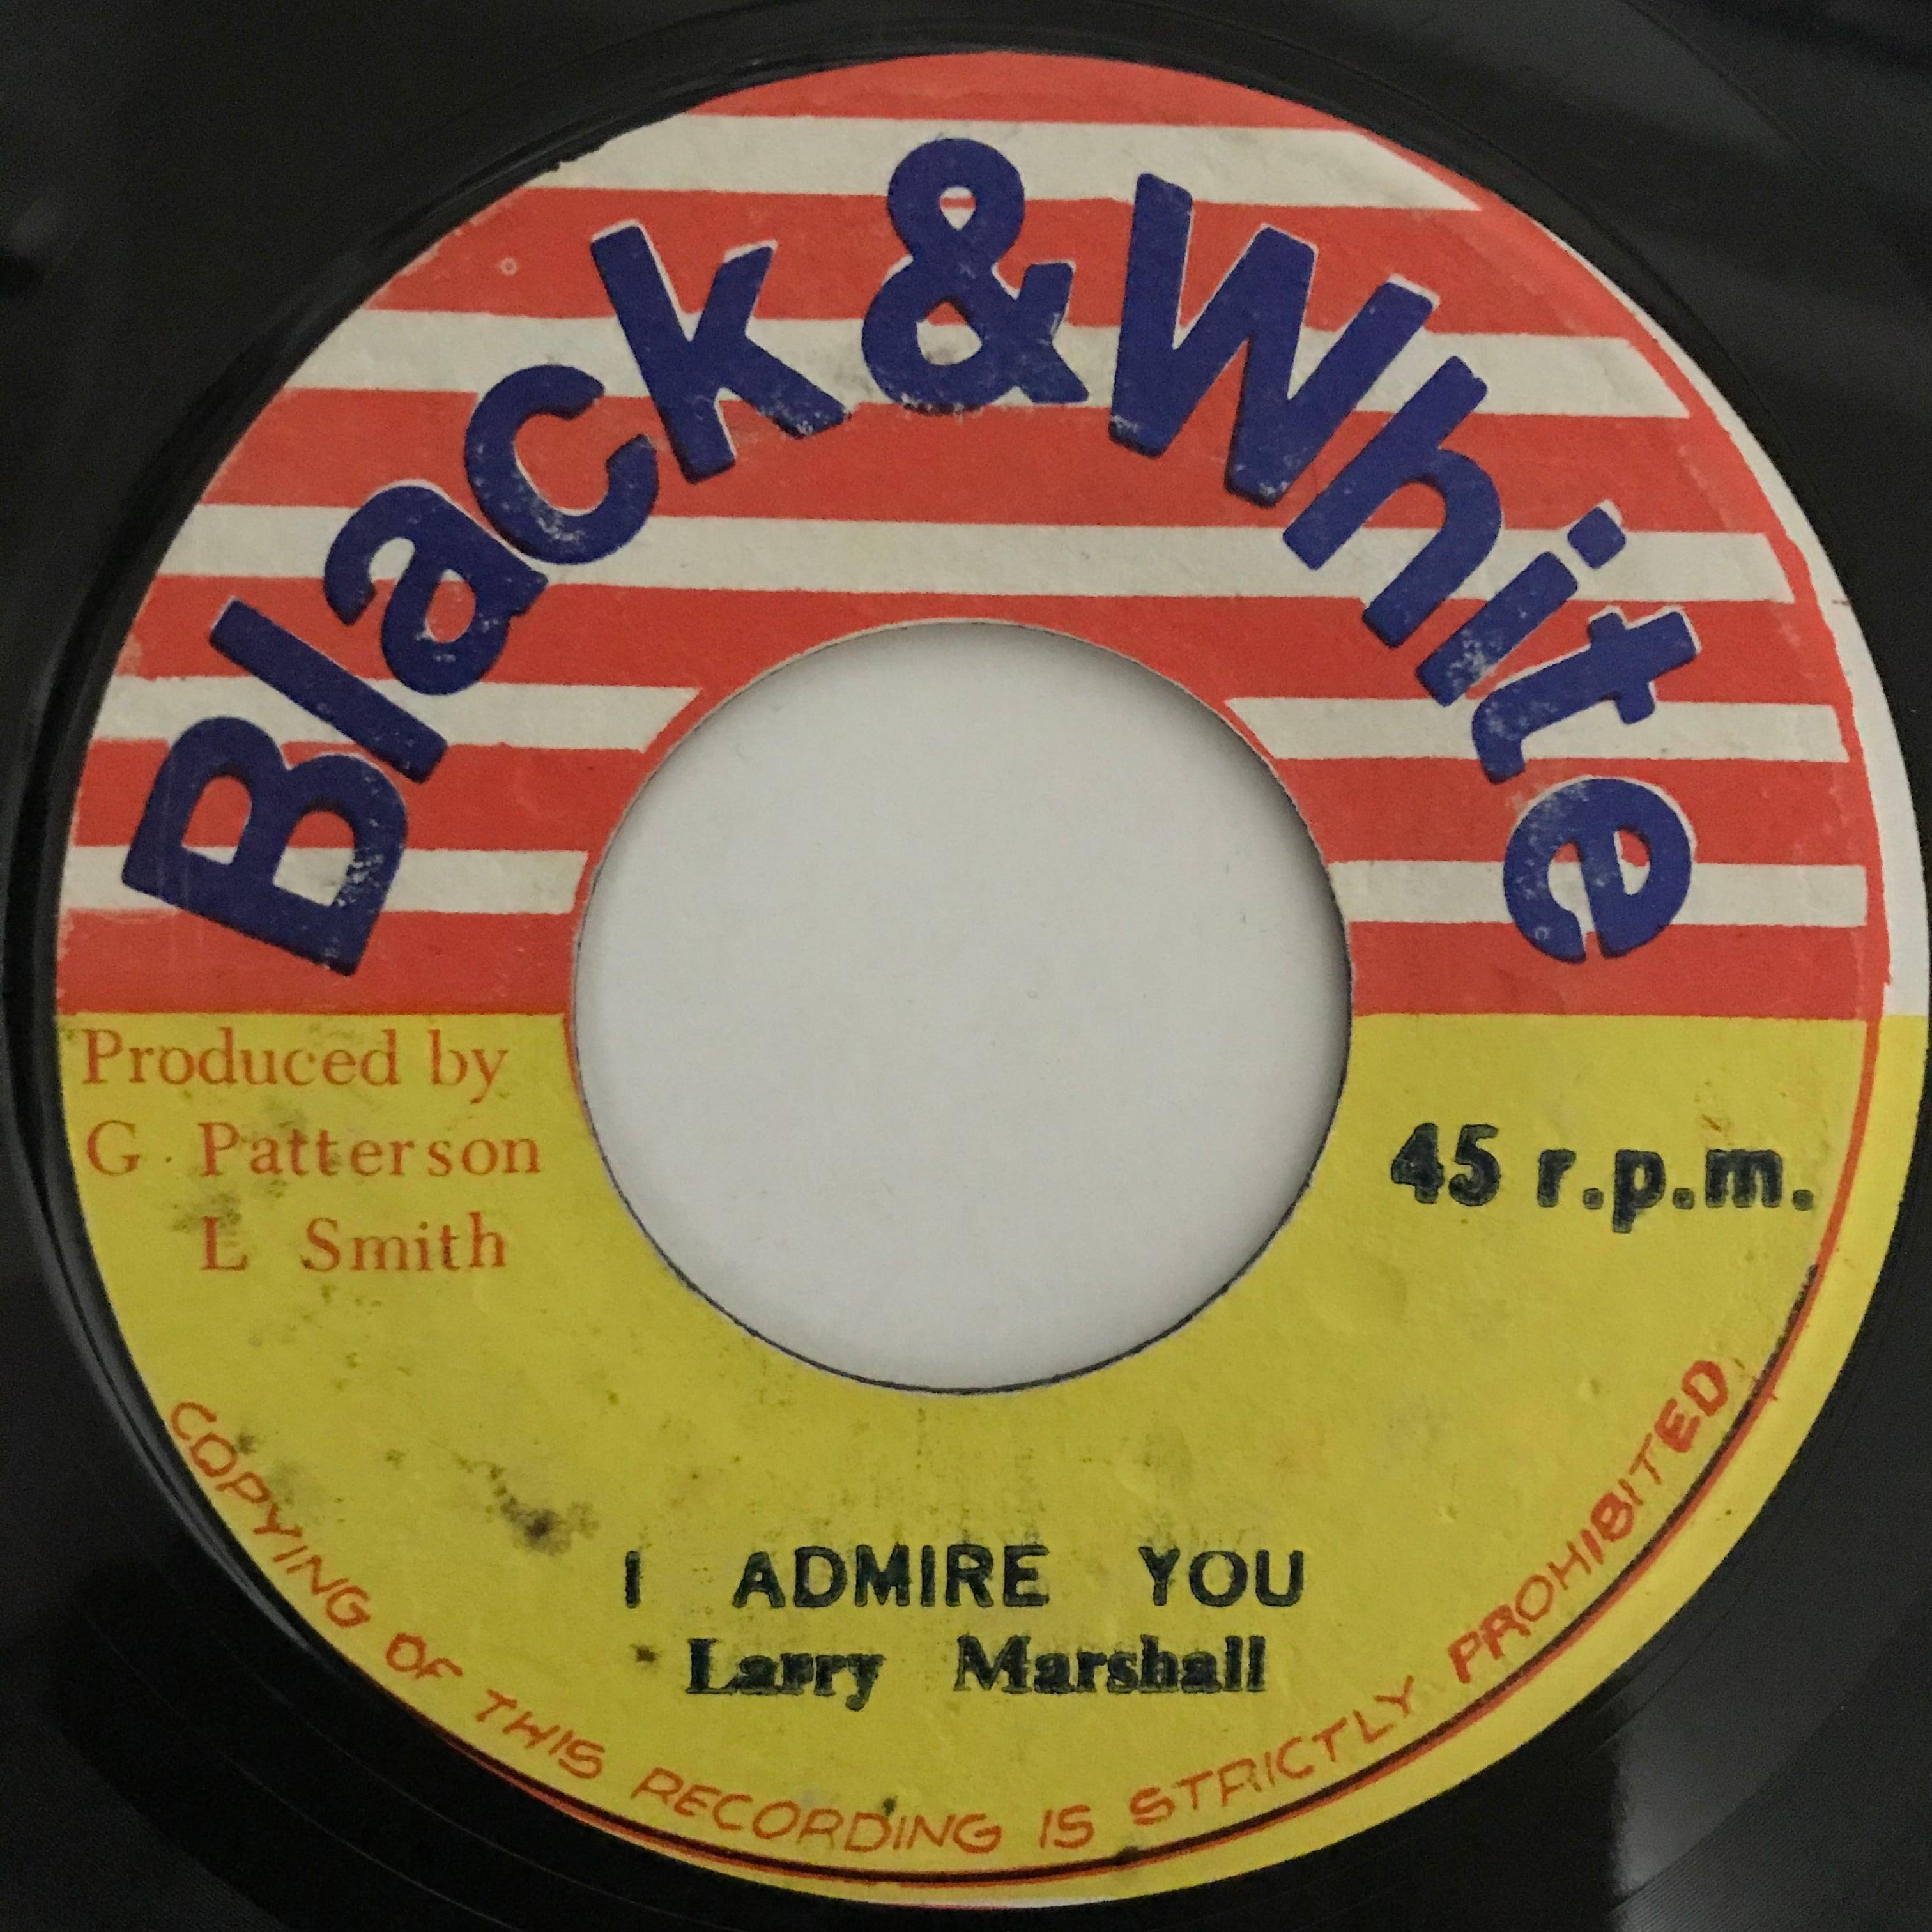 Larry Marshall - I Admire You 【7-10830】